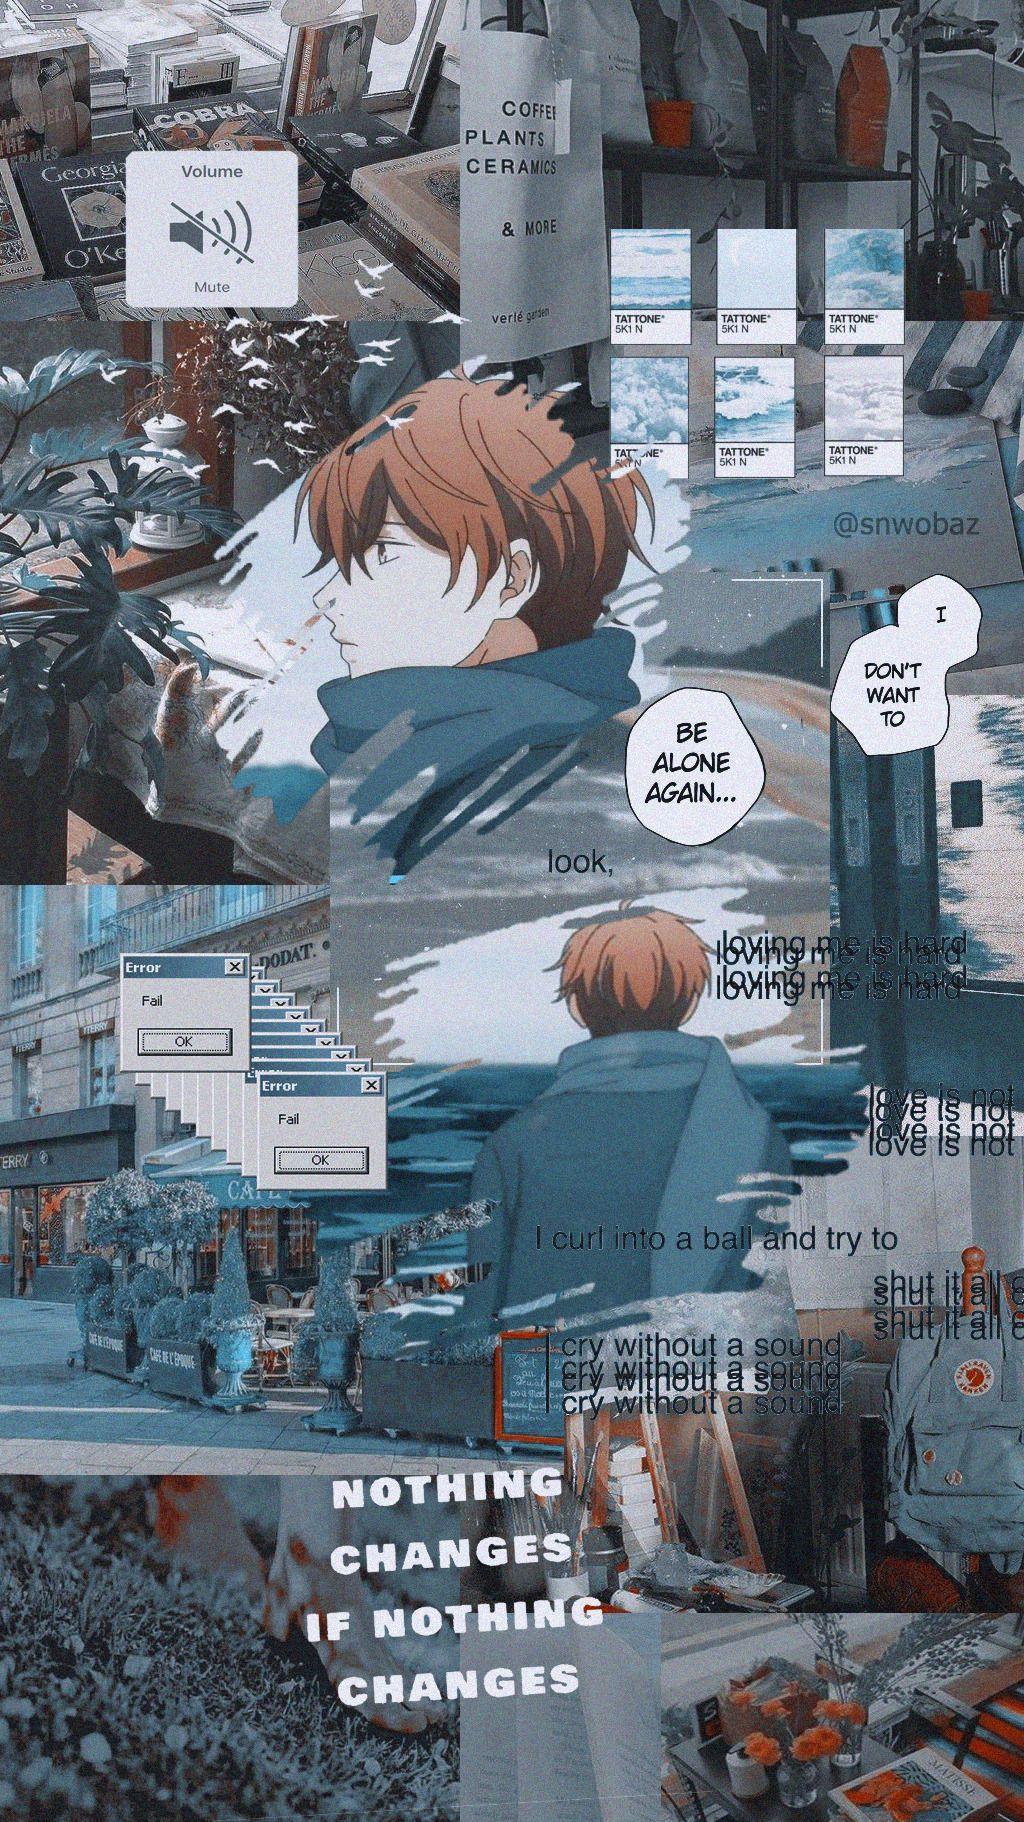 ɢɪᴠᴇɴ ϟ ᴍᴇᴍᴇs Anime estético, Fondo de anime y Fondos de